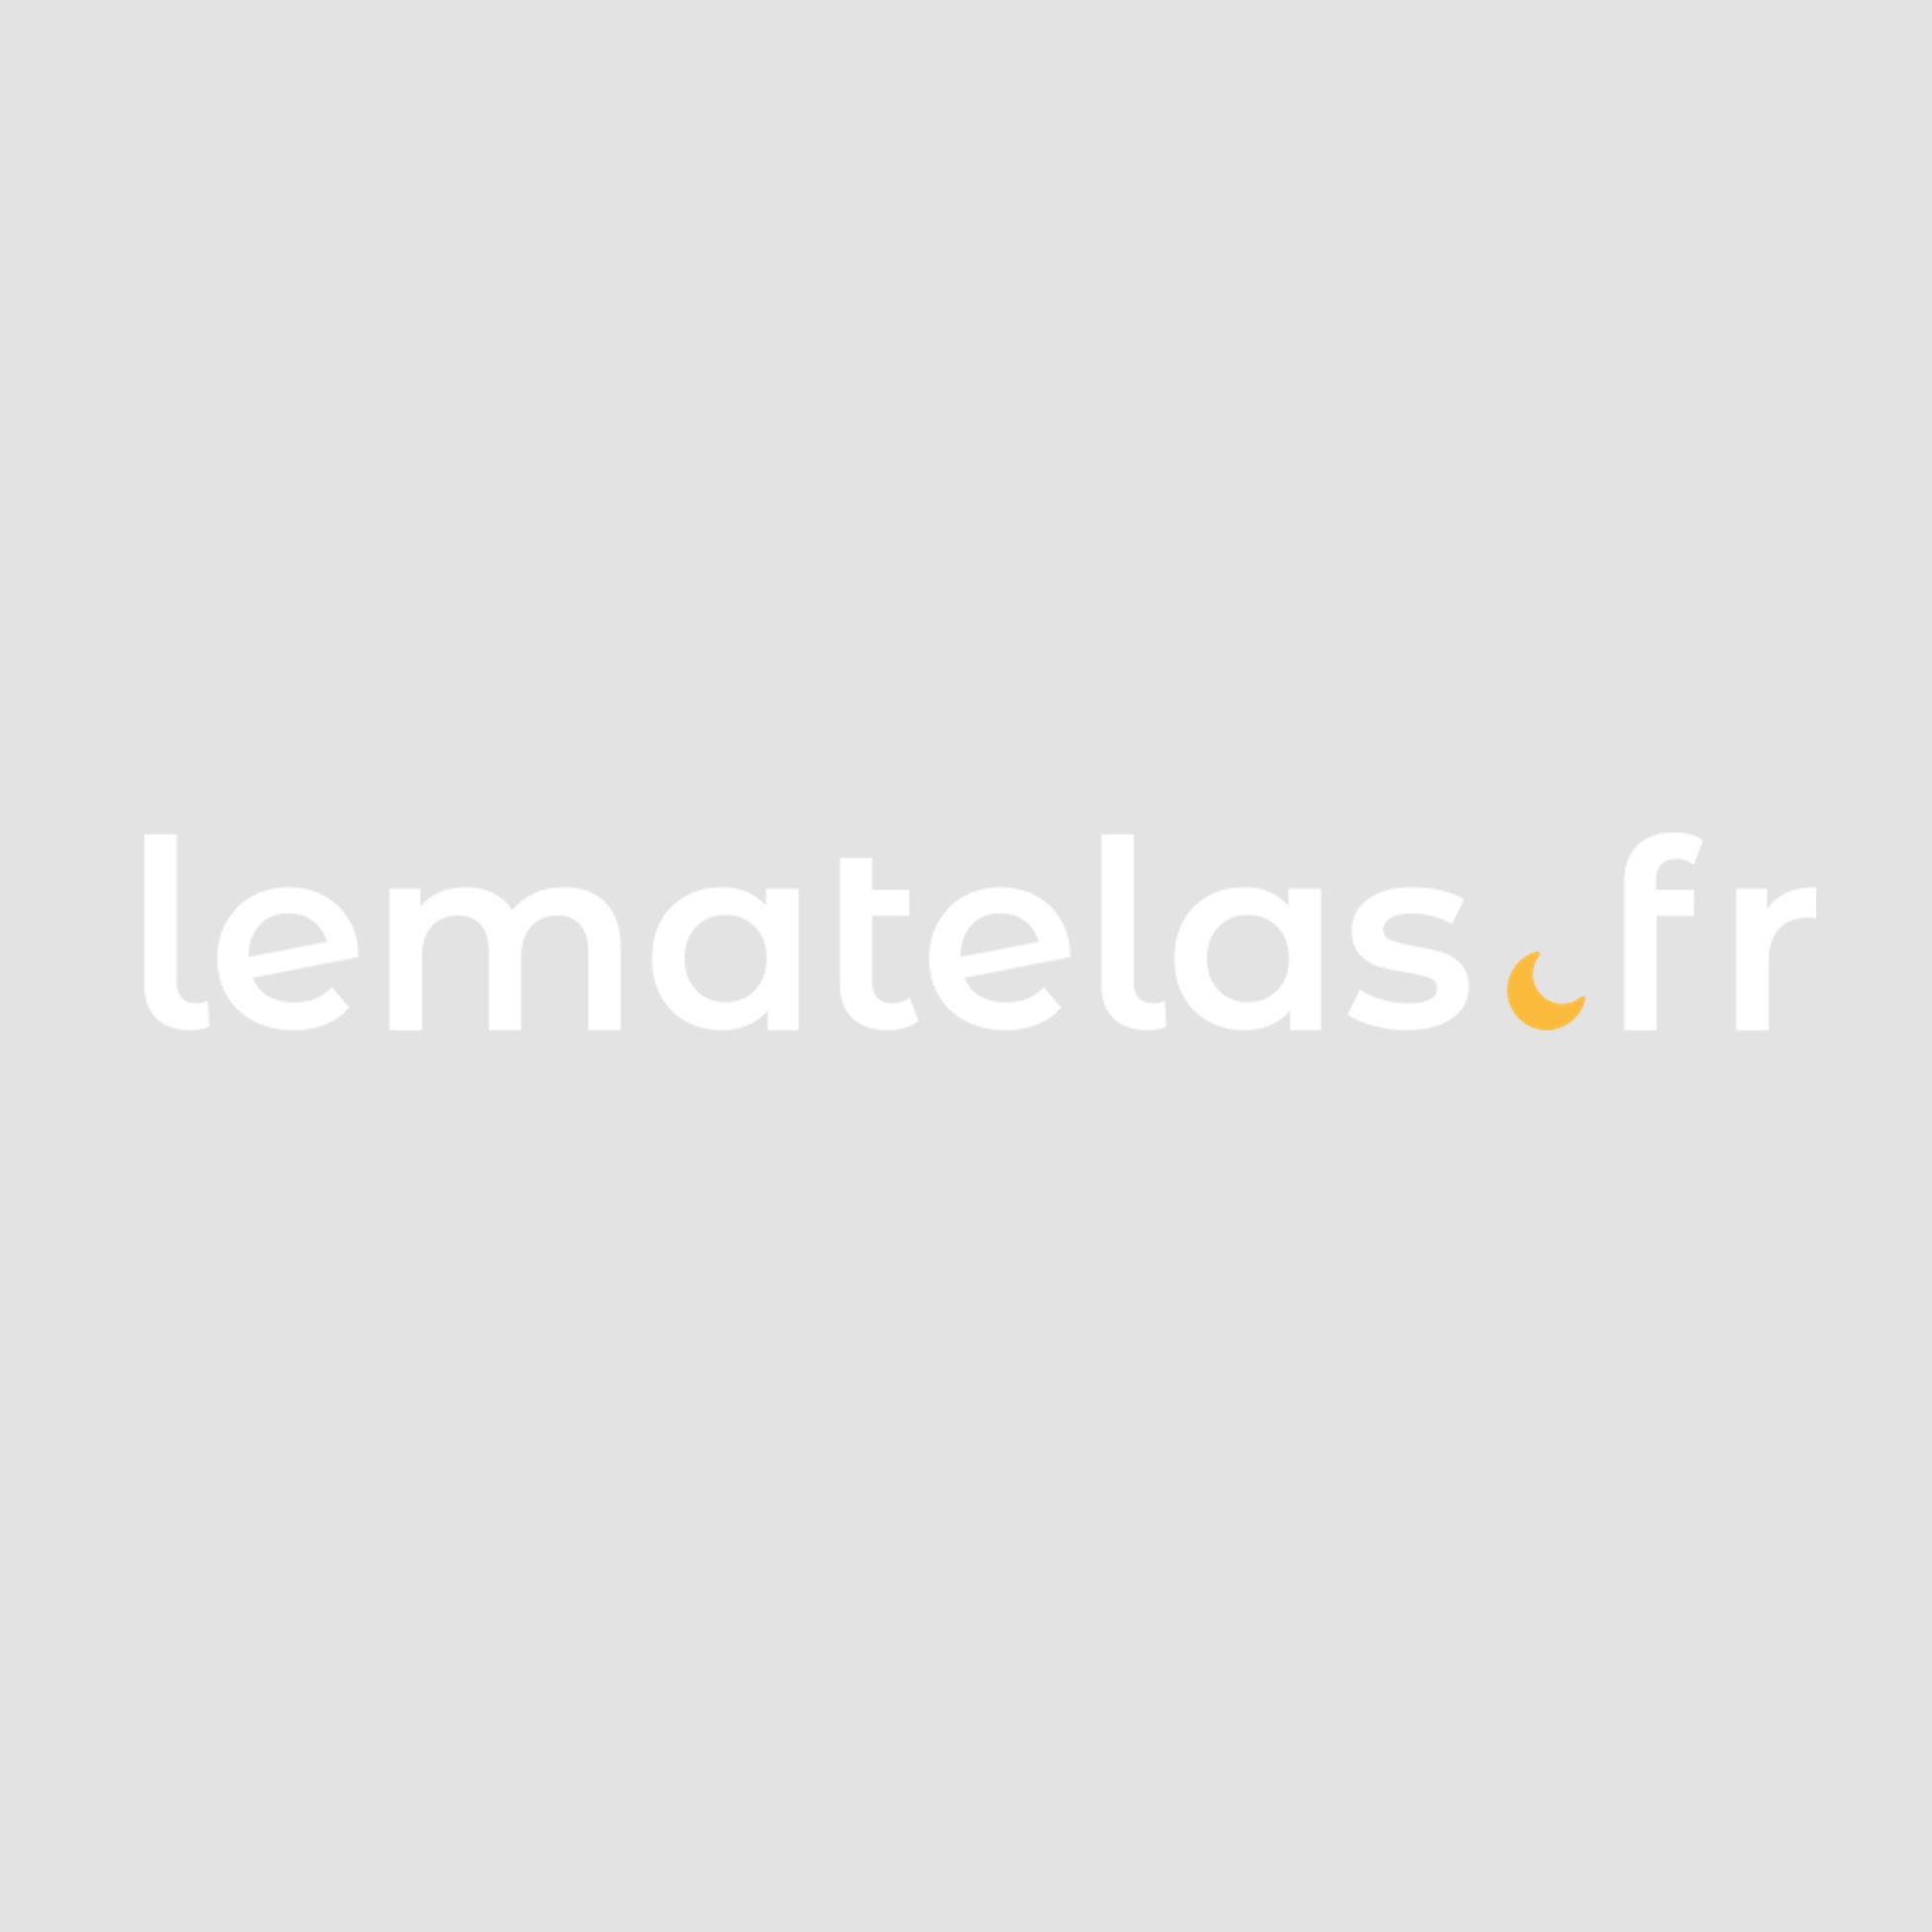 bureau enfant en bois ch ne brut et blanc meg ve. Black Bedroom Furniture Sets. Home Design Ideas